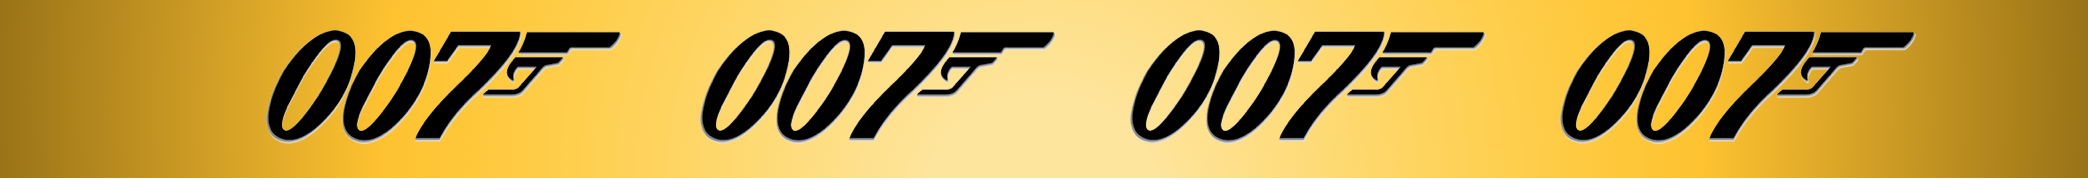 EB 007 Gun Divider